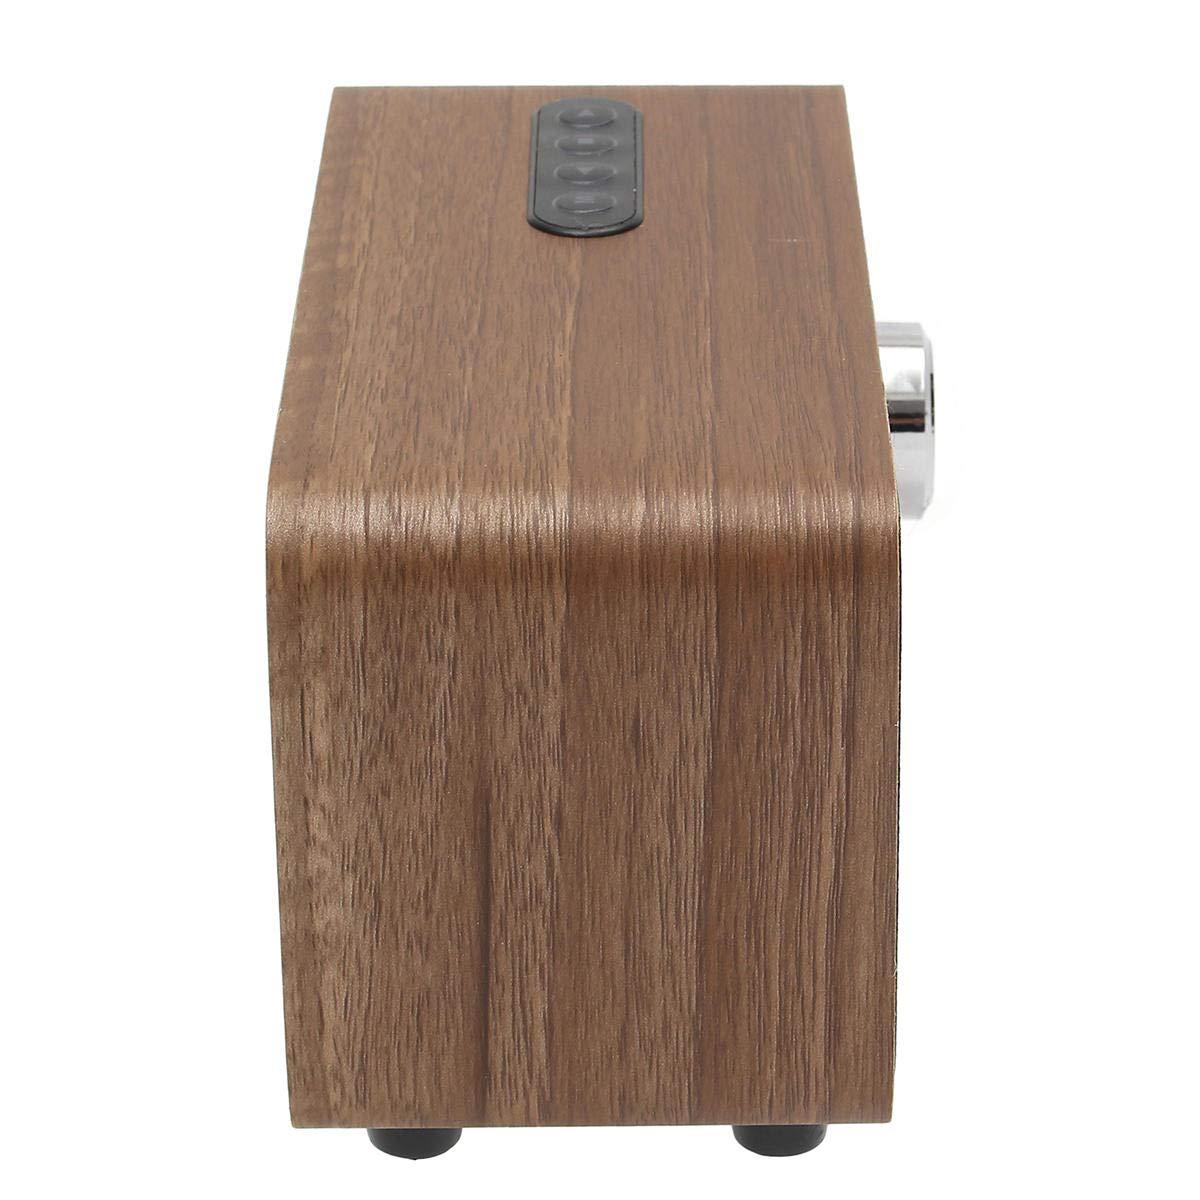 Radio Bluetooth Speaker - Sports & Outdoor - 1PCs